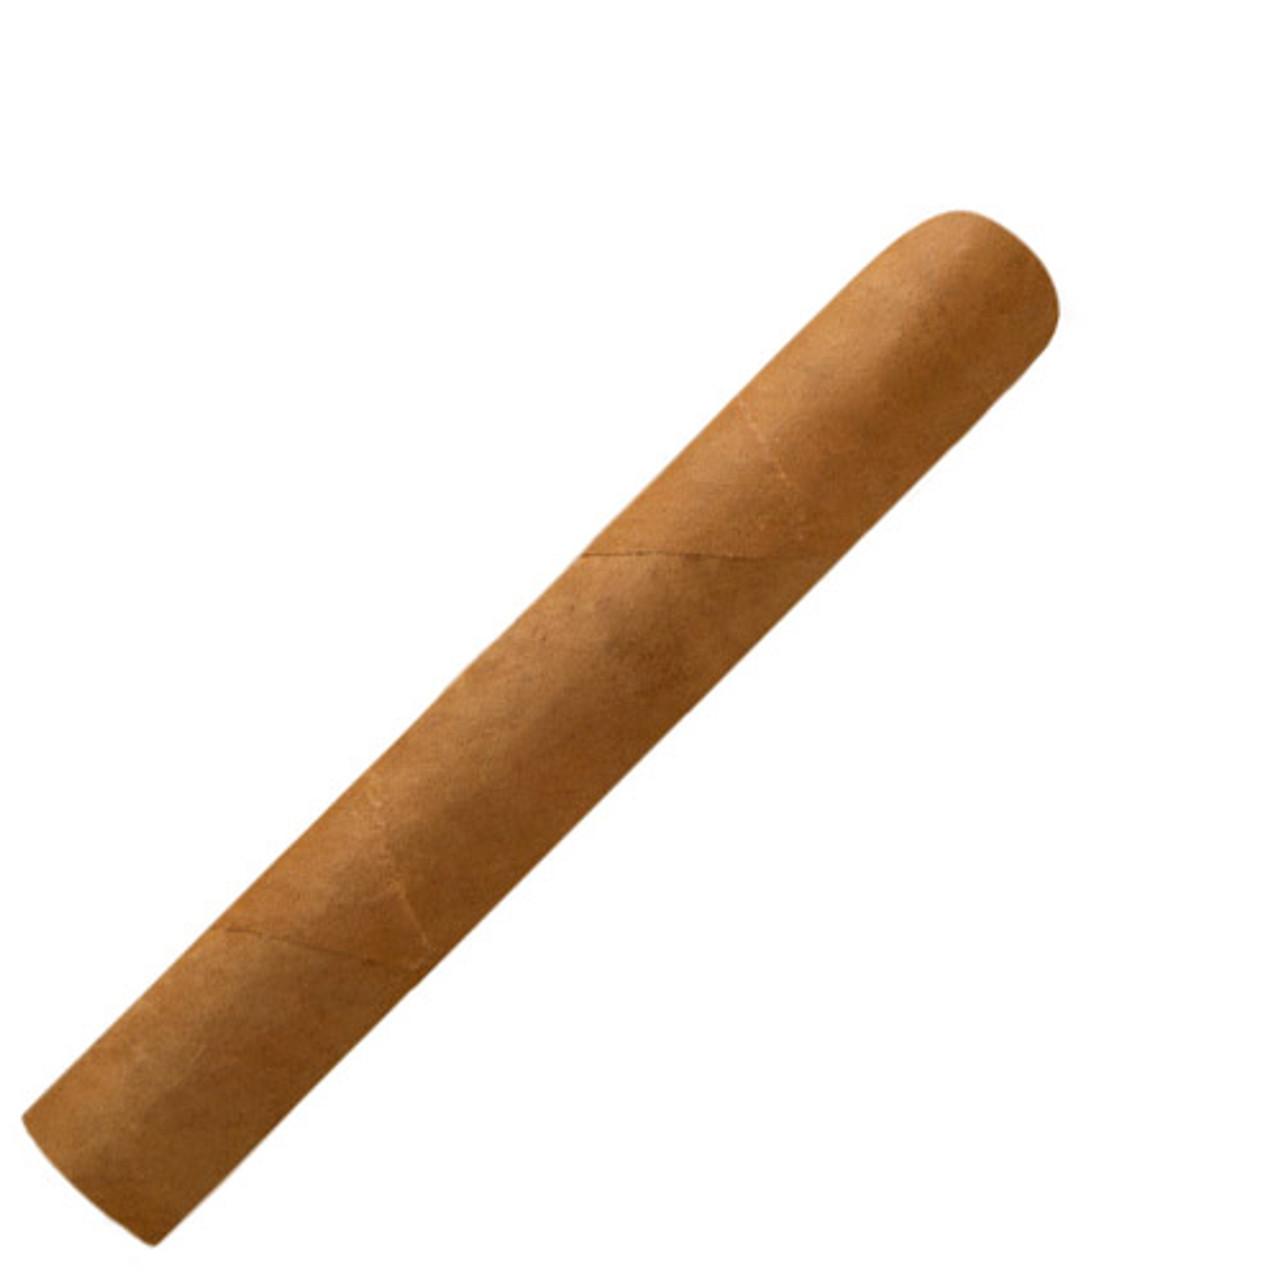 Nicaraguan Overruns Connecticut Robusto Cigars - 5 x 54 (Bundle of 20)